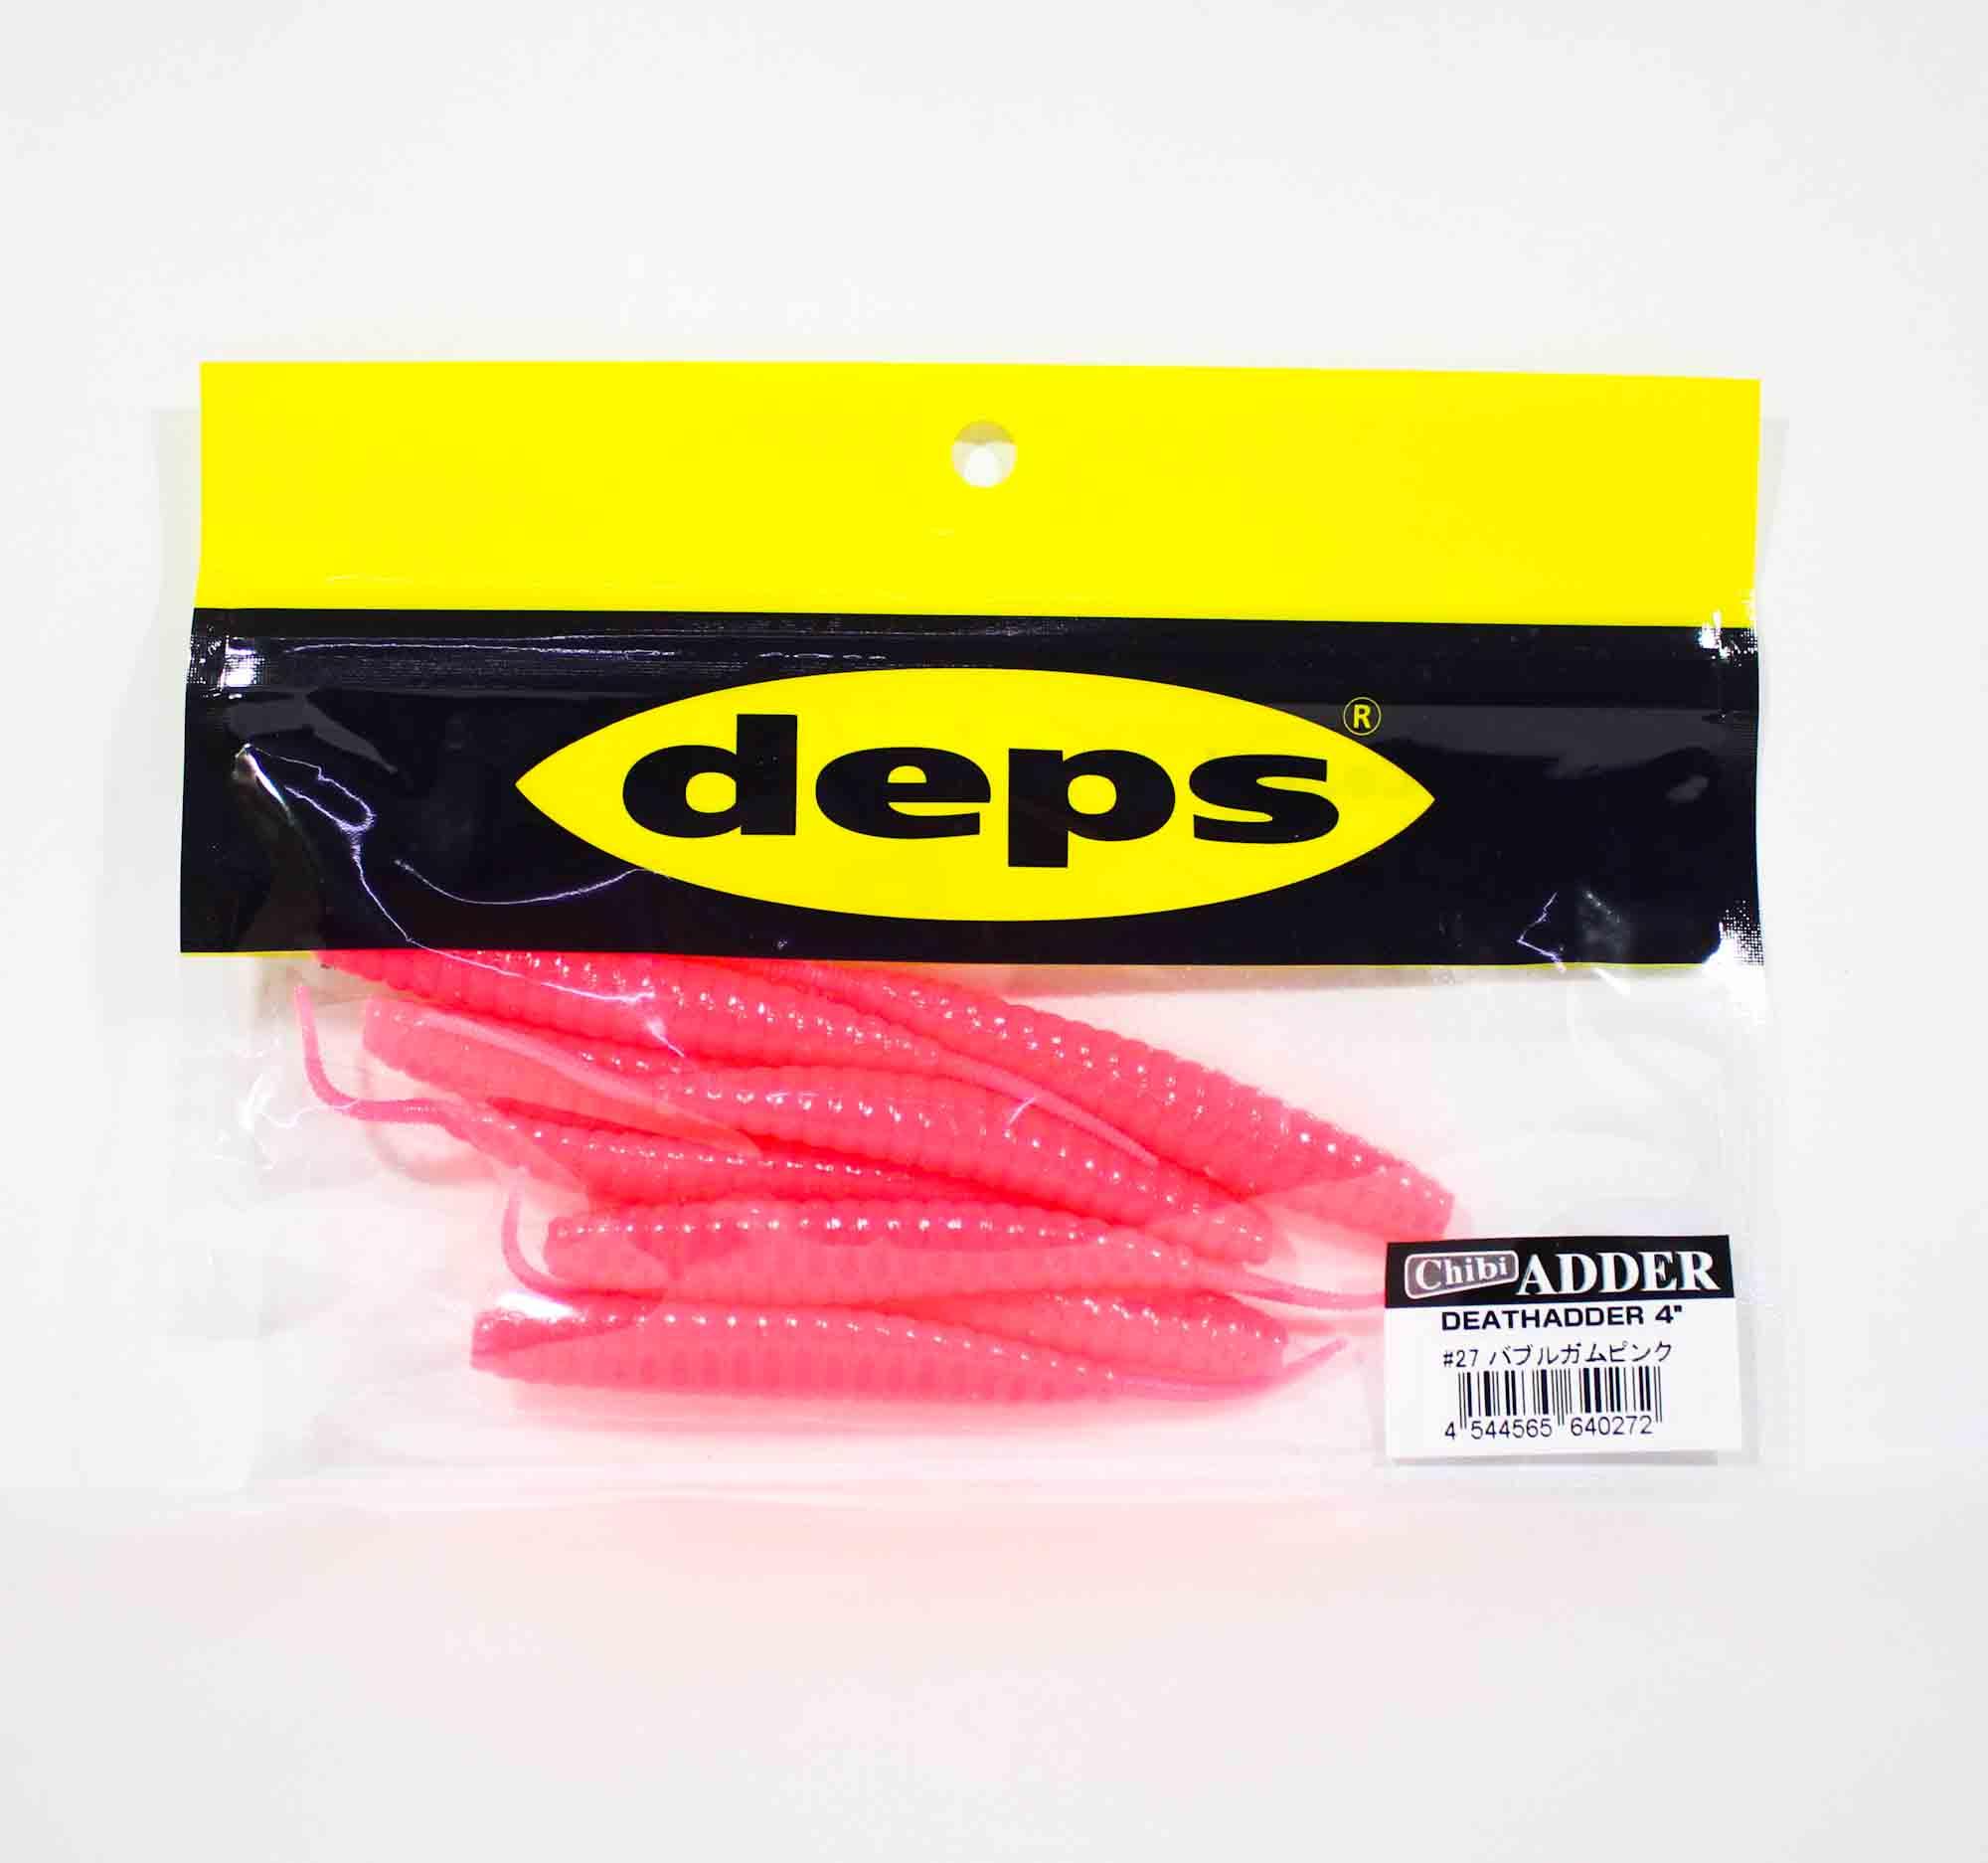 Deps Soft Lure Death Adder 4 Inch 8 per pack 27 (0272)